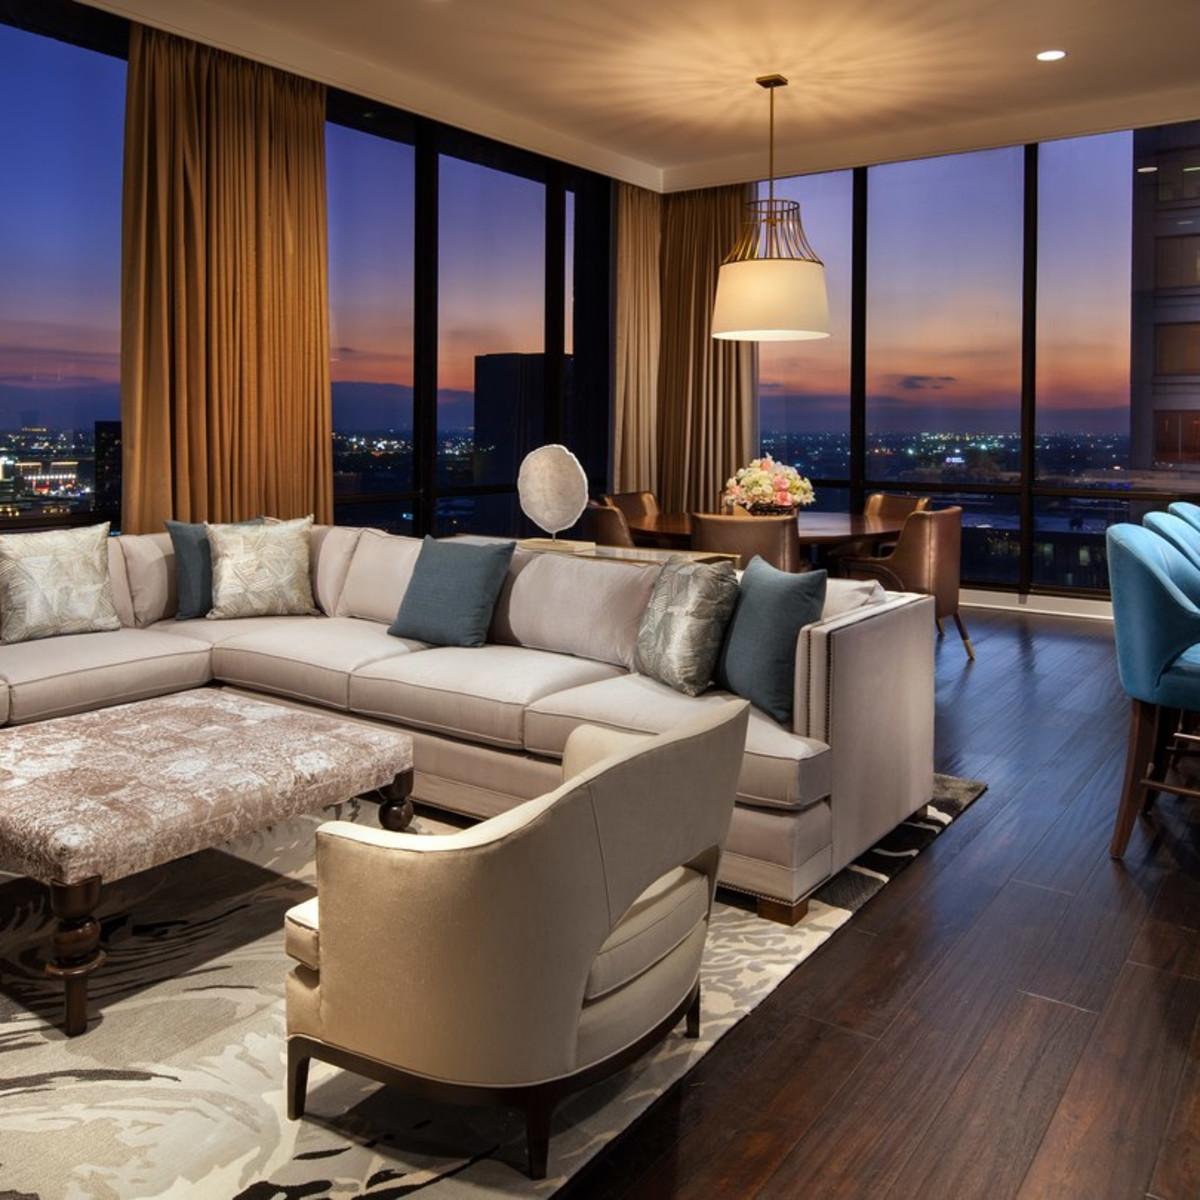 Westin Oaks Houston Heavenly Suite living room